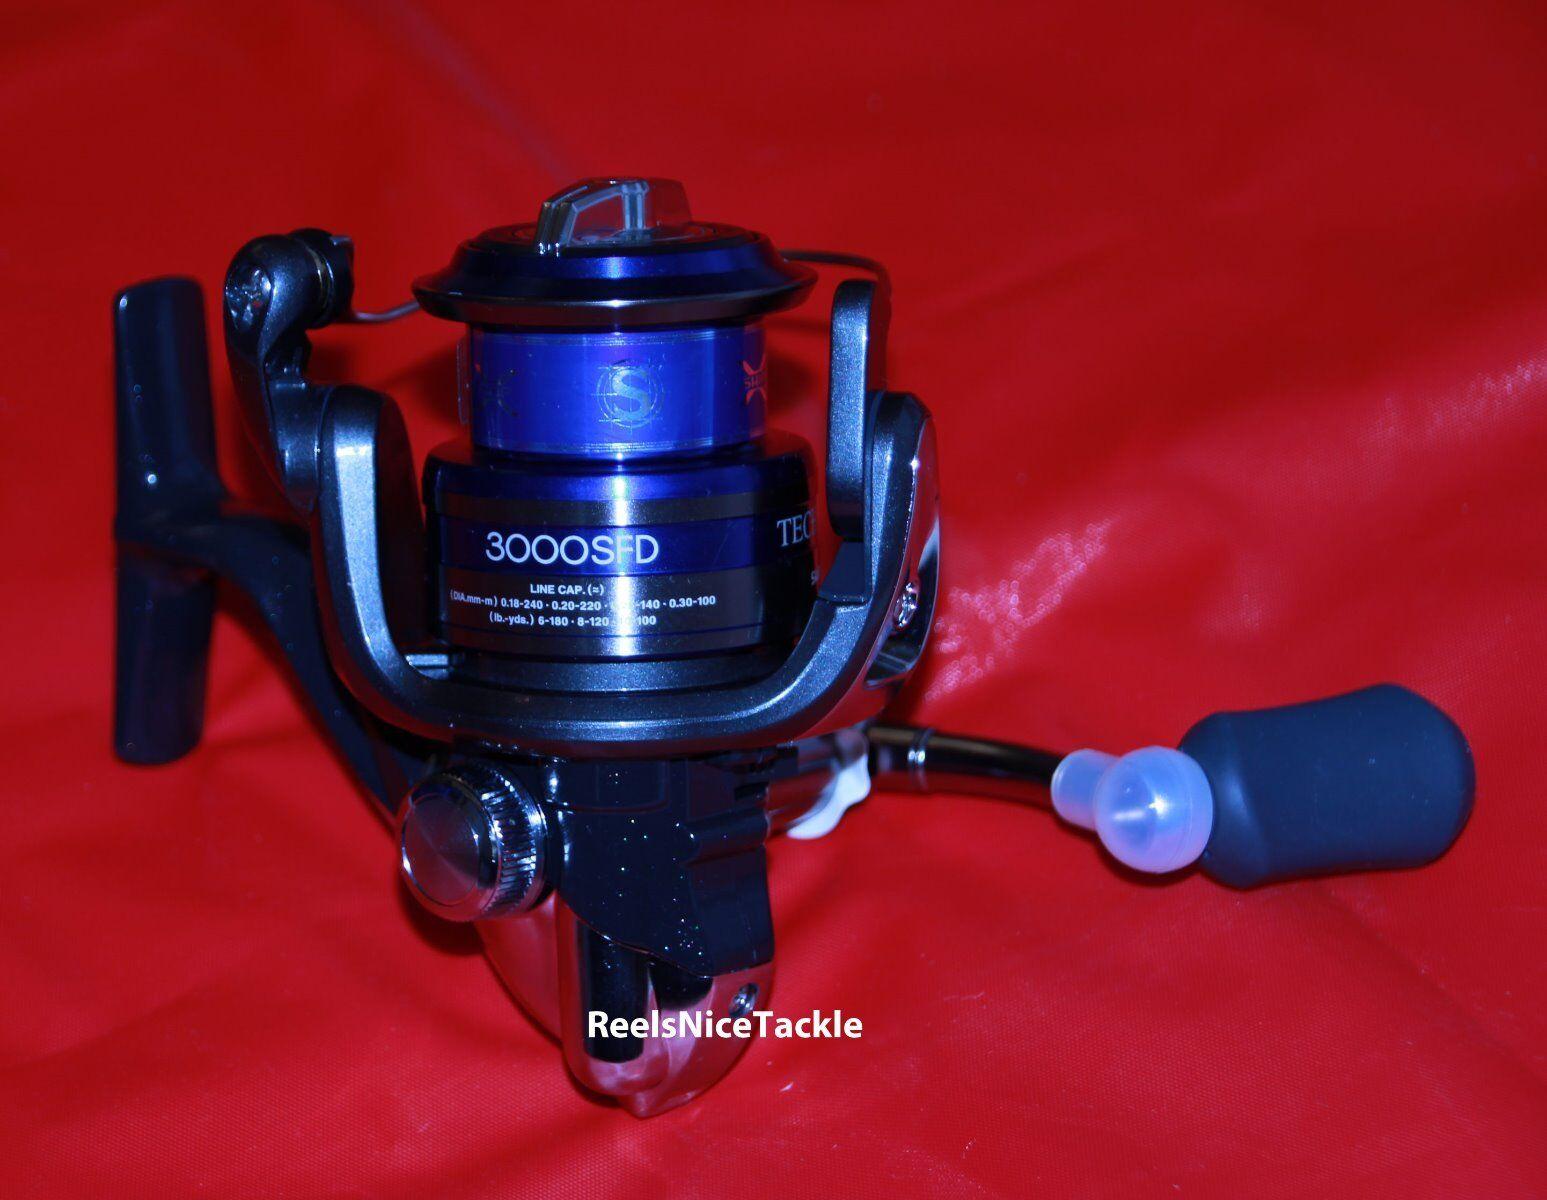 NIB Shimano Technium 3000 SFD Spinning Reel 3 TEC3000SFD plus spare spool FREE 3 Reel D a9deee